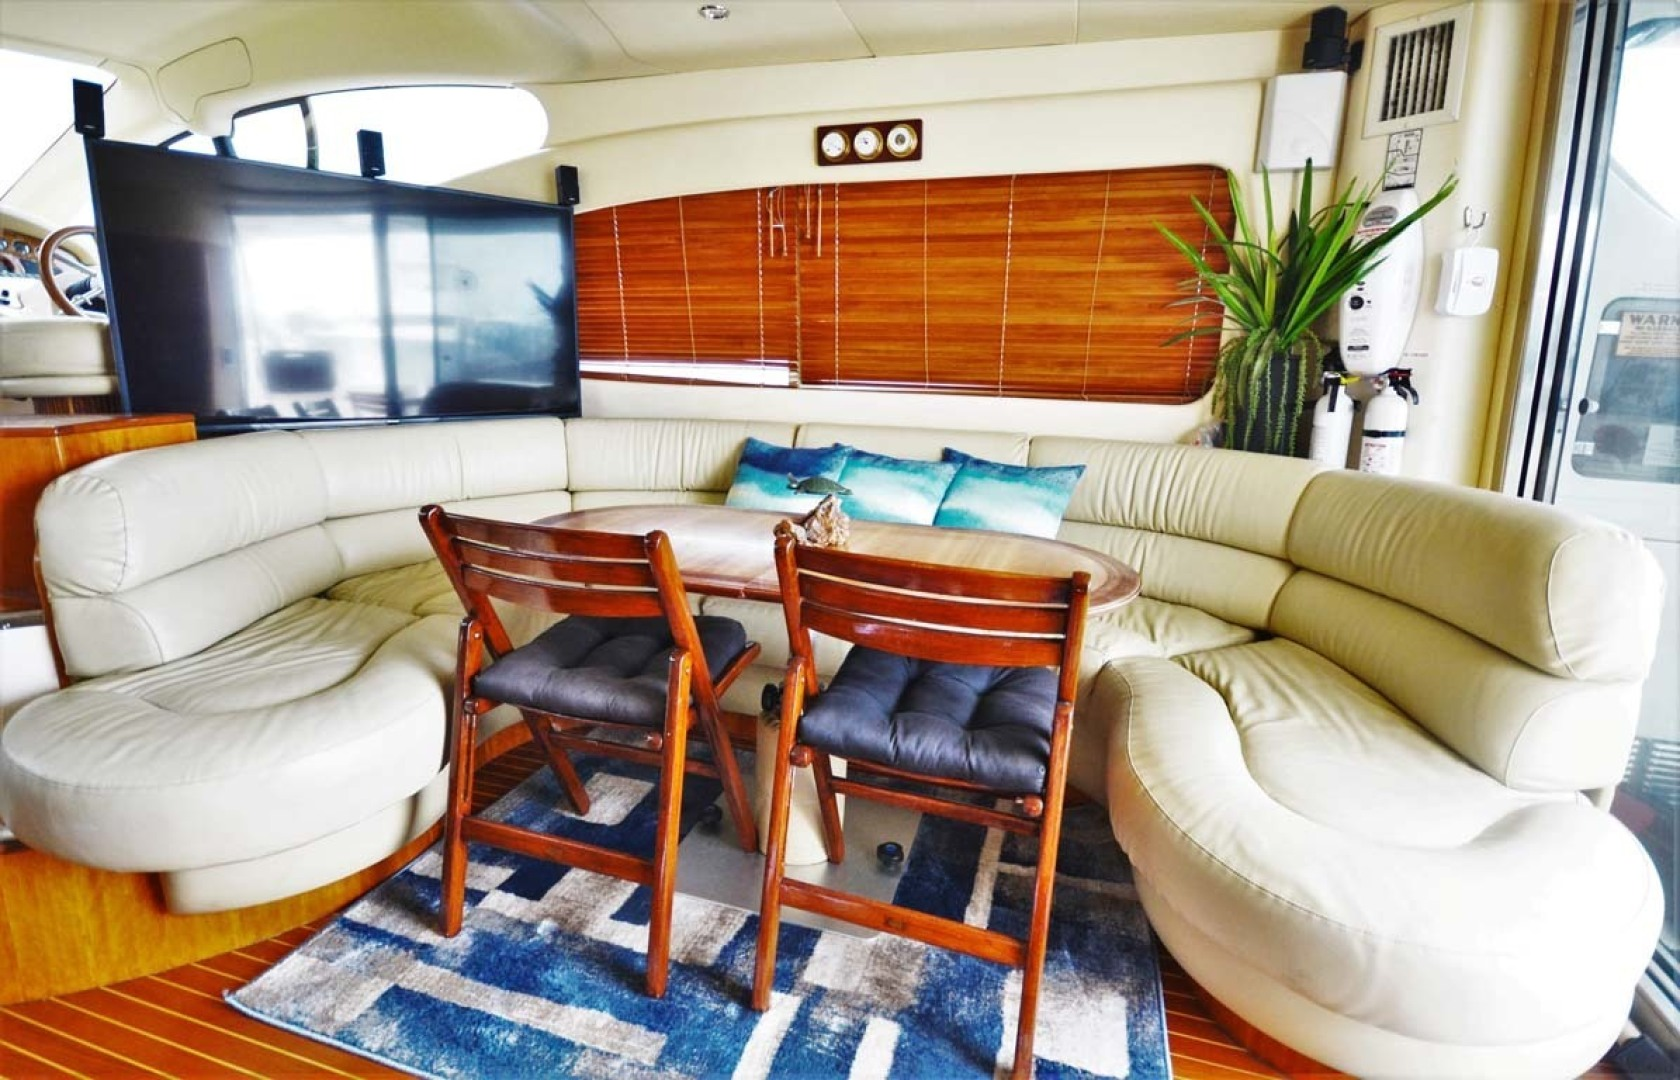 Azimut-46 Motor Yacht 2003-ChrAmy Melbourne-Florida-United States-Salon Sofa And Dinette-1318889 | Thumbnail